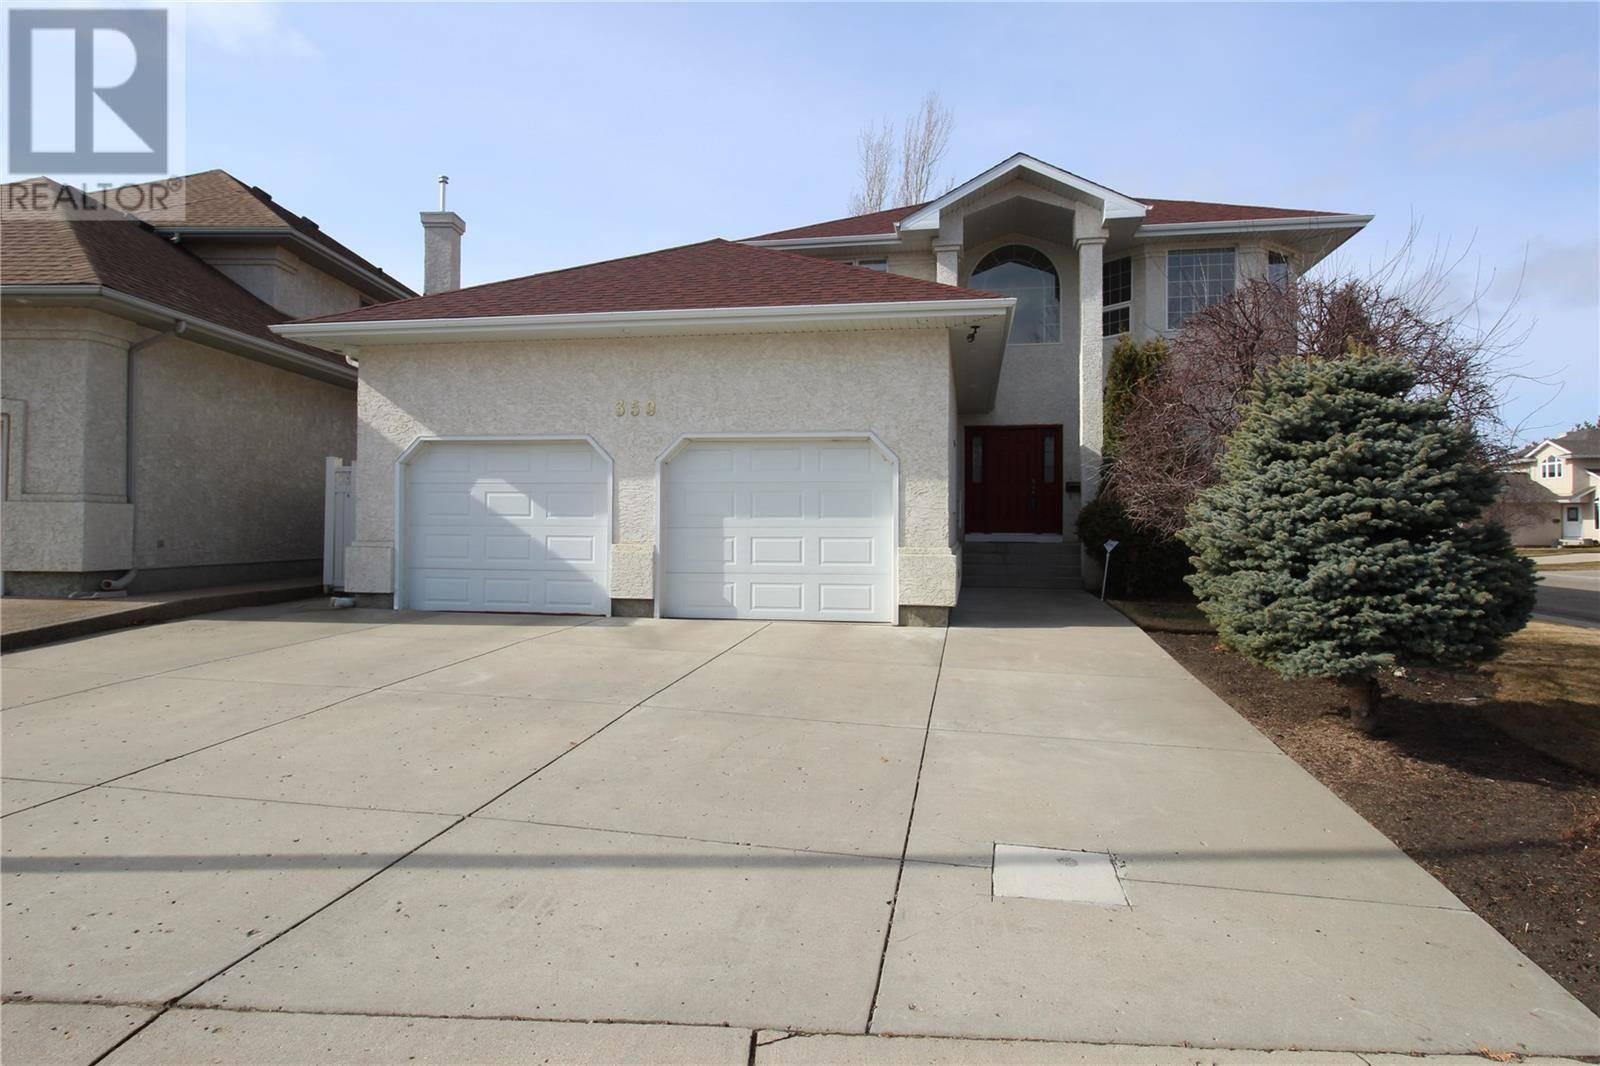 House for sale at 359 Chotem Ter  Saskatoon Saskatchewan - MLS: SK779293